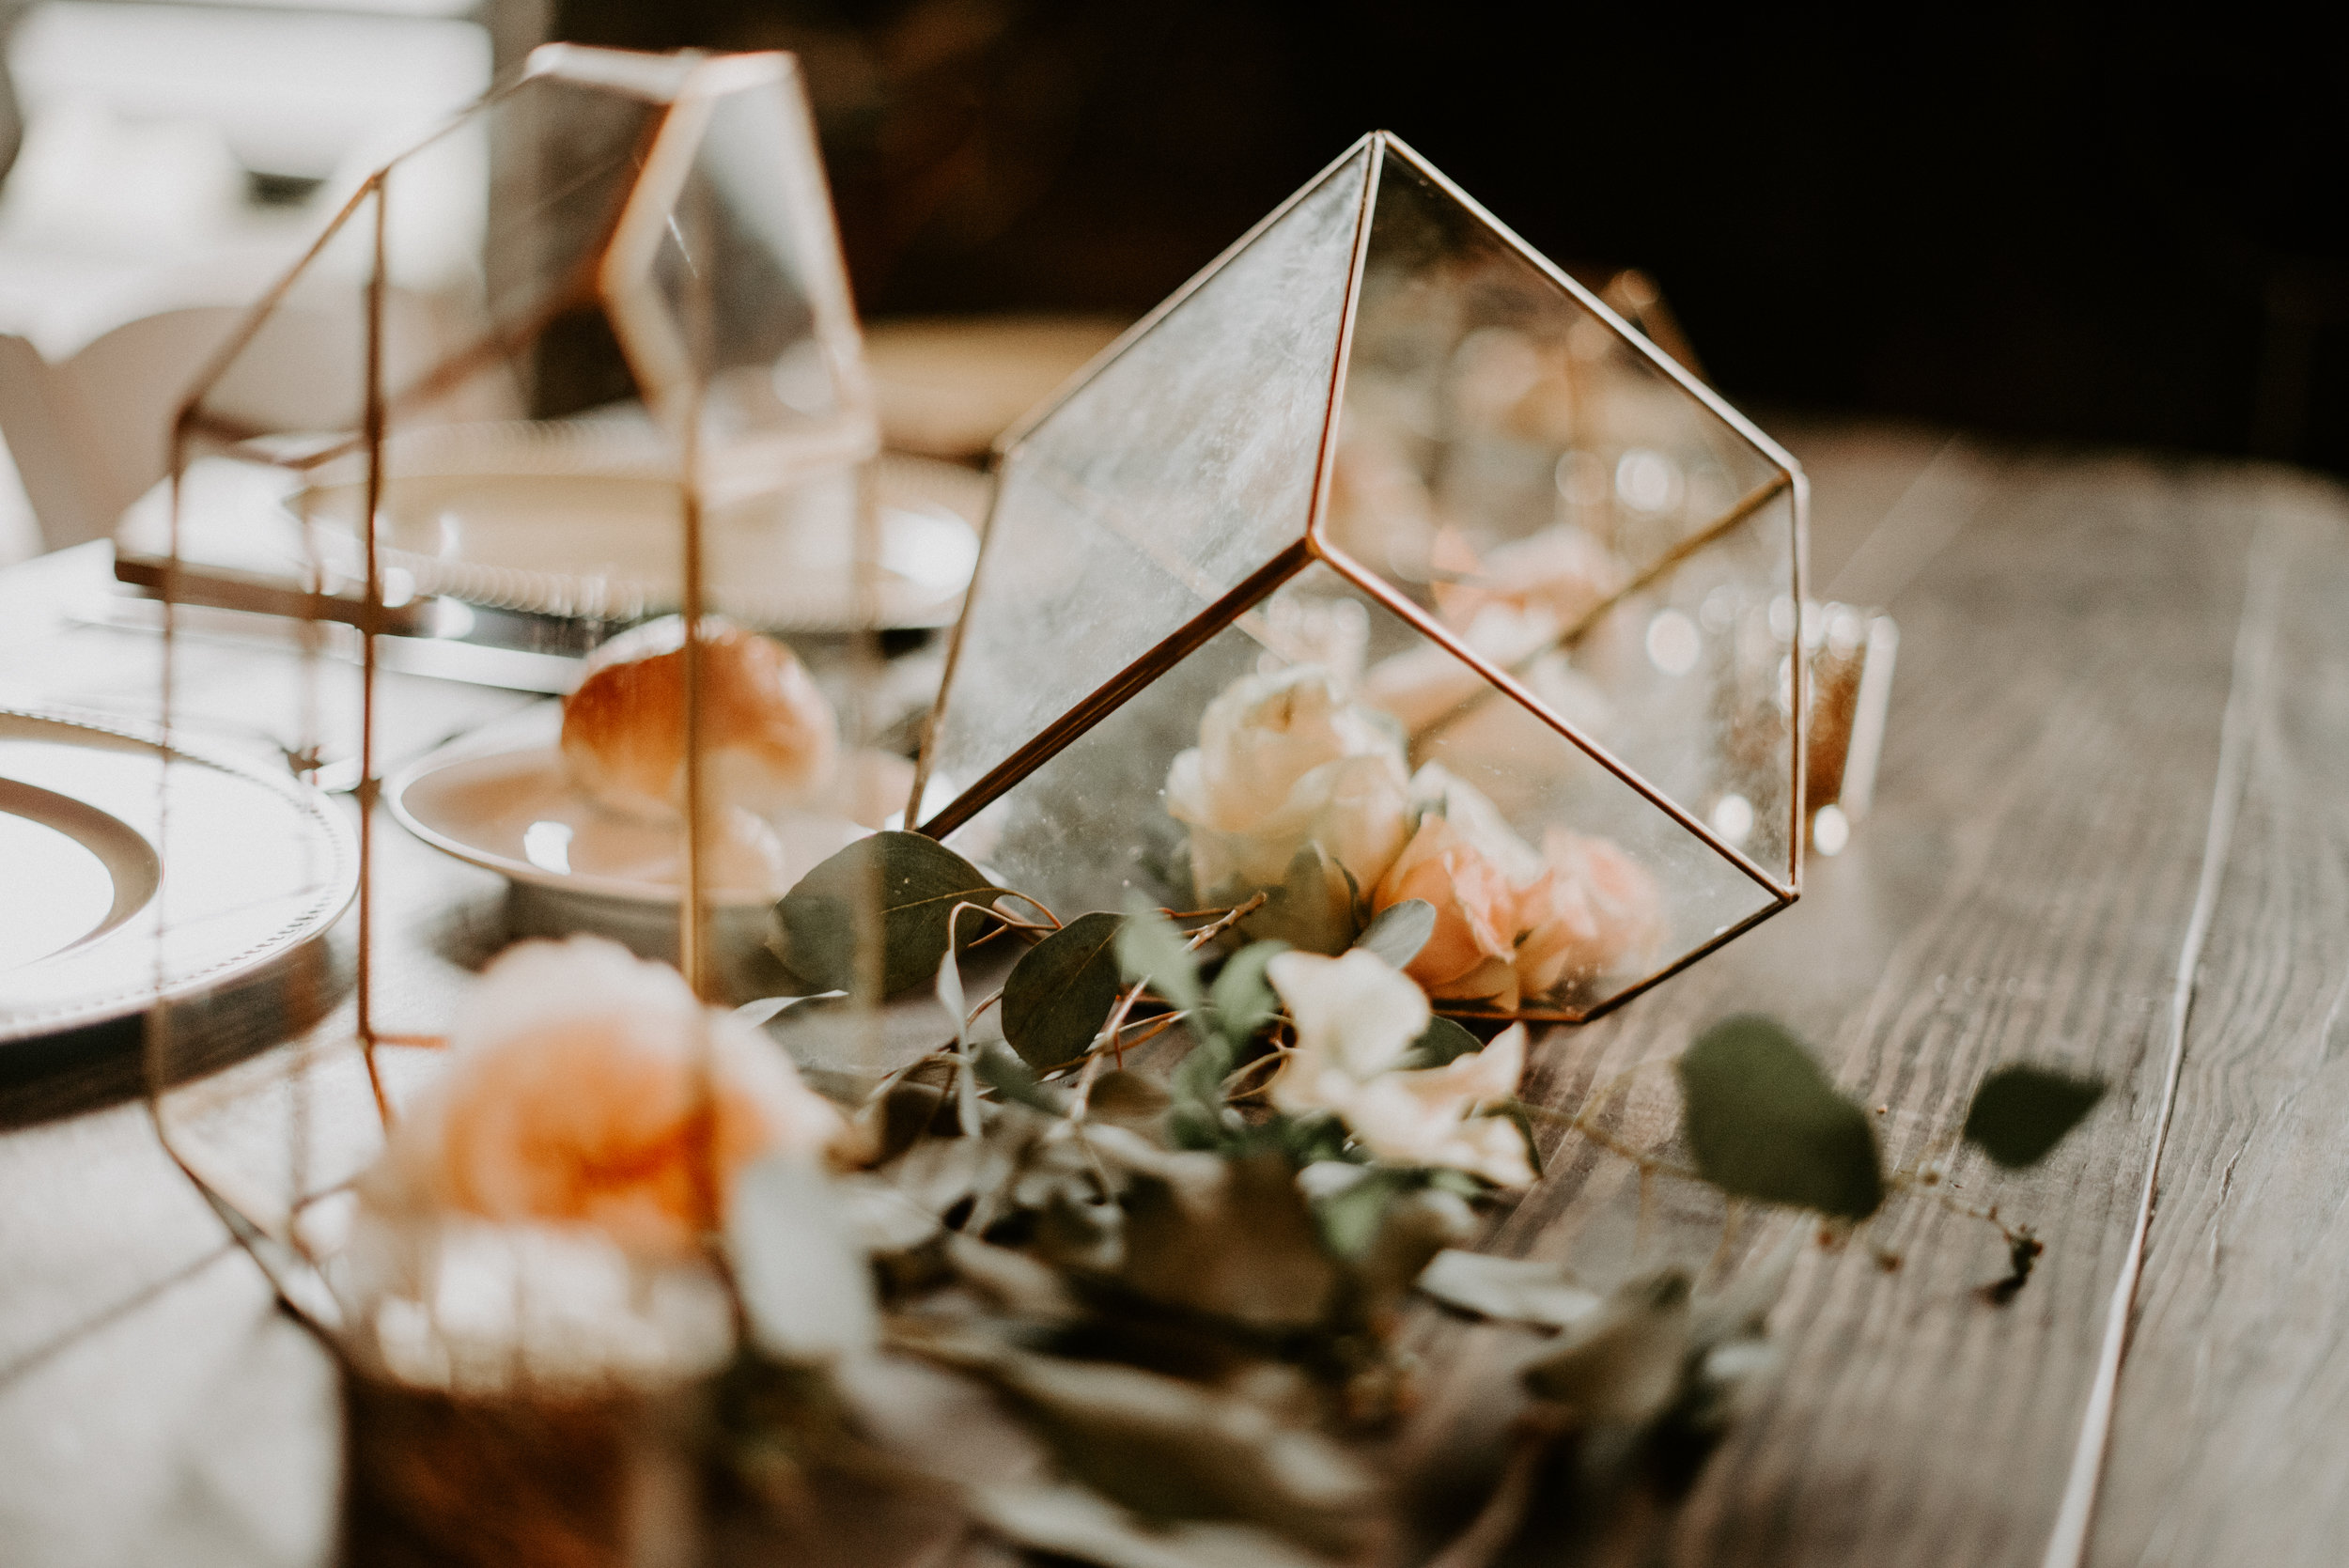 savannah-bridal-shop-andrea-and-mike-evergold-photography-georgia-state-railroad-museum-wedding-savannah-wedding-florist-savannah-wedding-planner-53.jpg